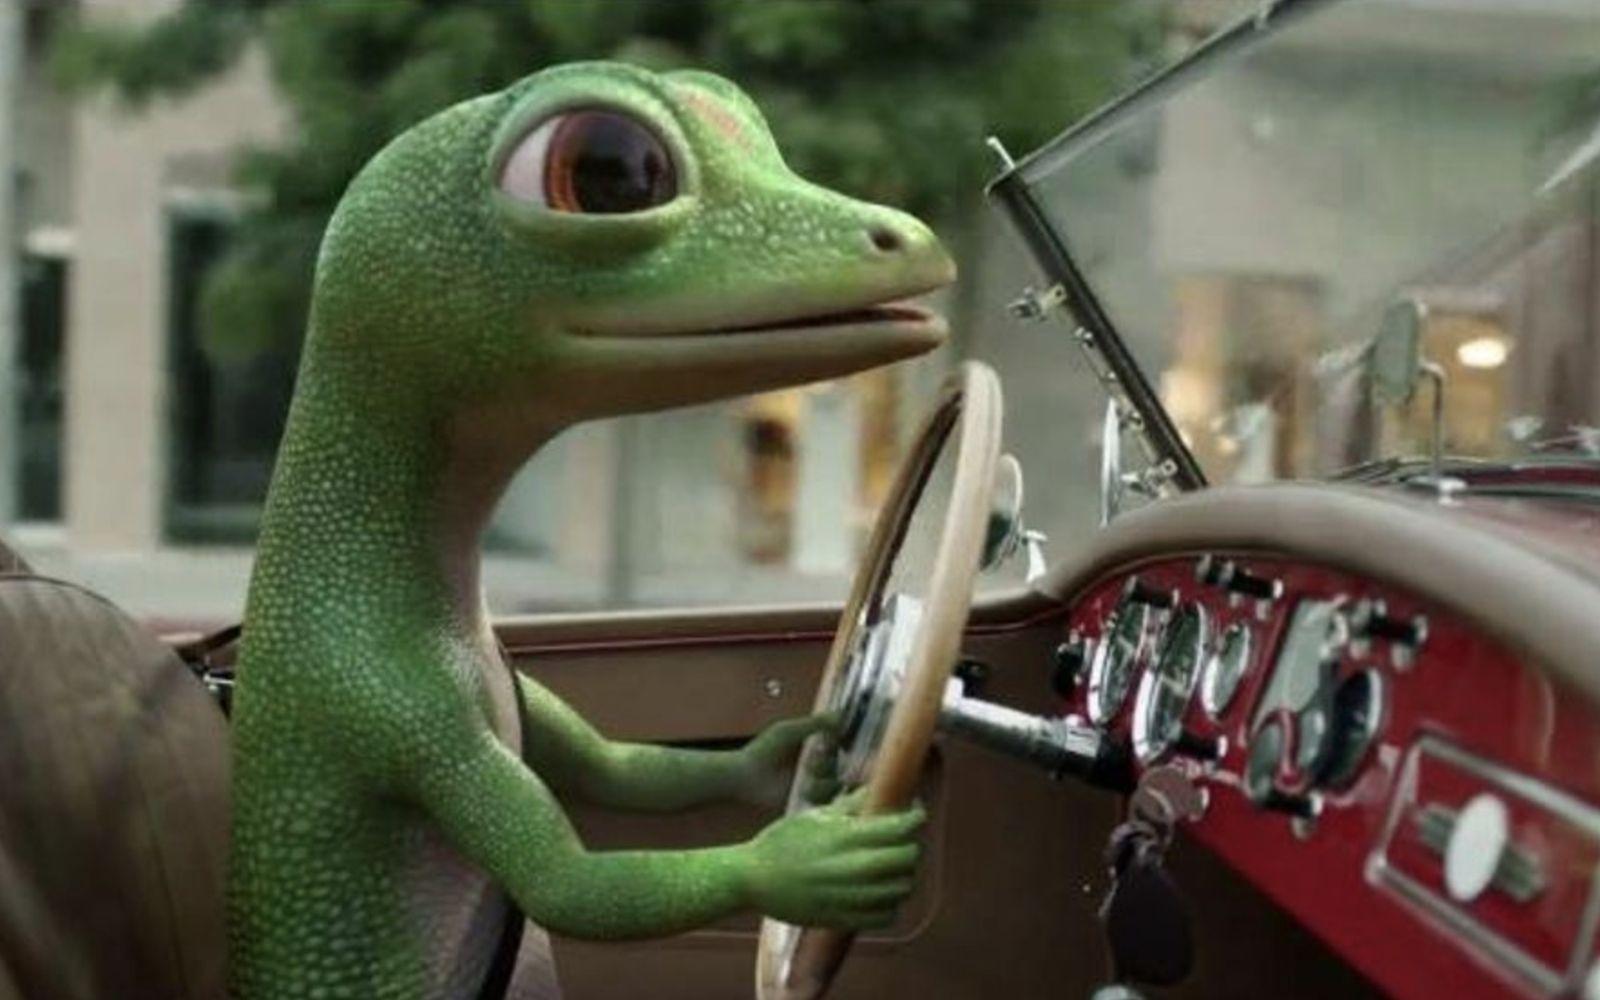 Can the Geiko Lizard save us? Canadian Home, auto